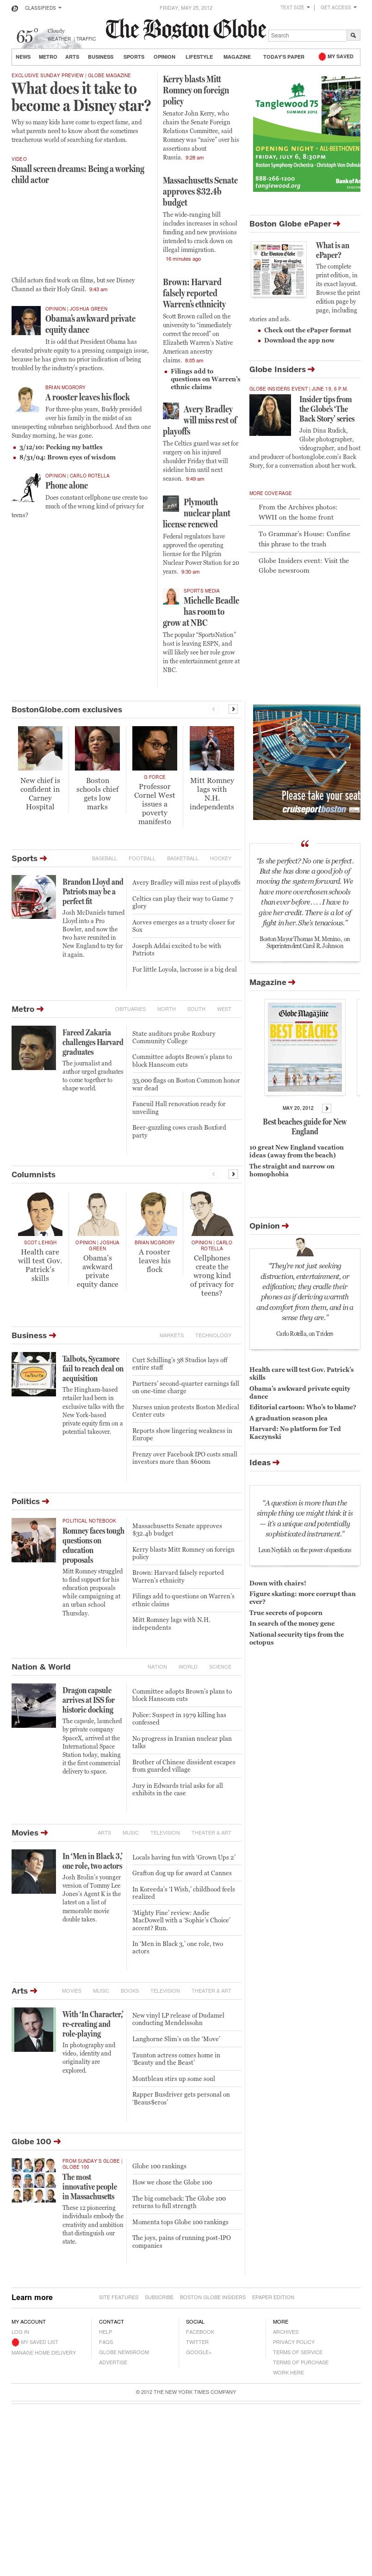 The Boston Globe at Friday May 25, 2012, 6:02 p.m. UTC